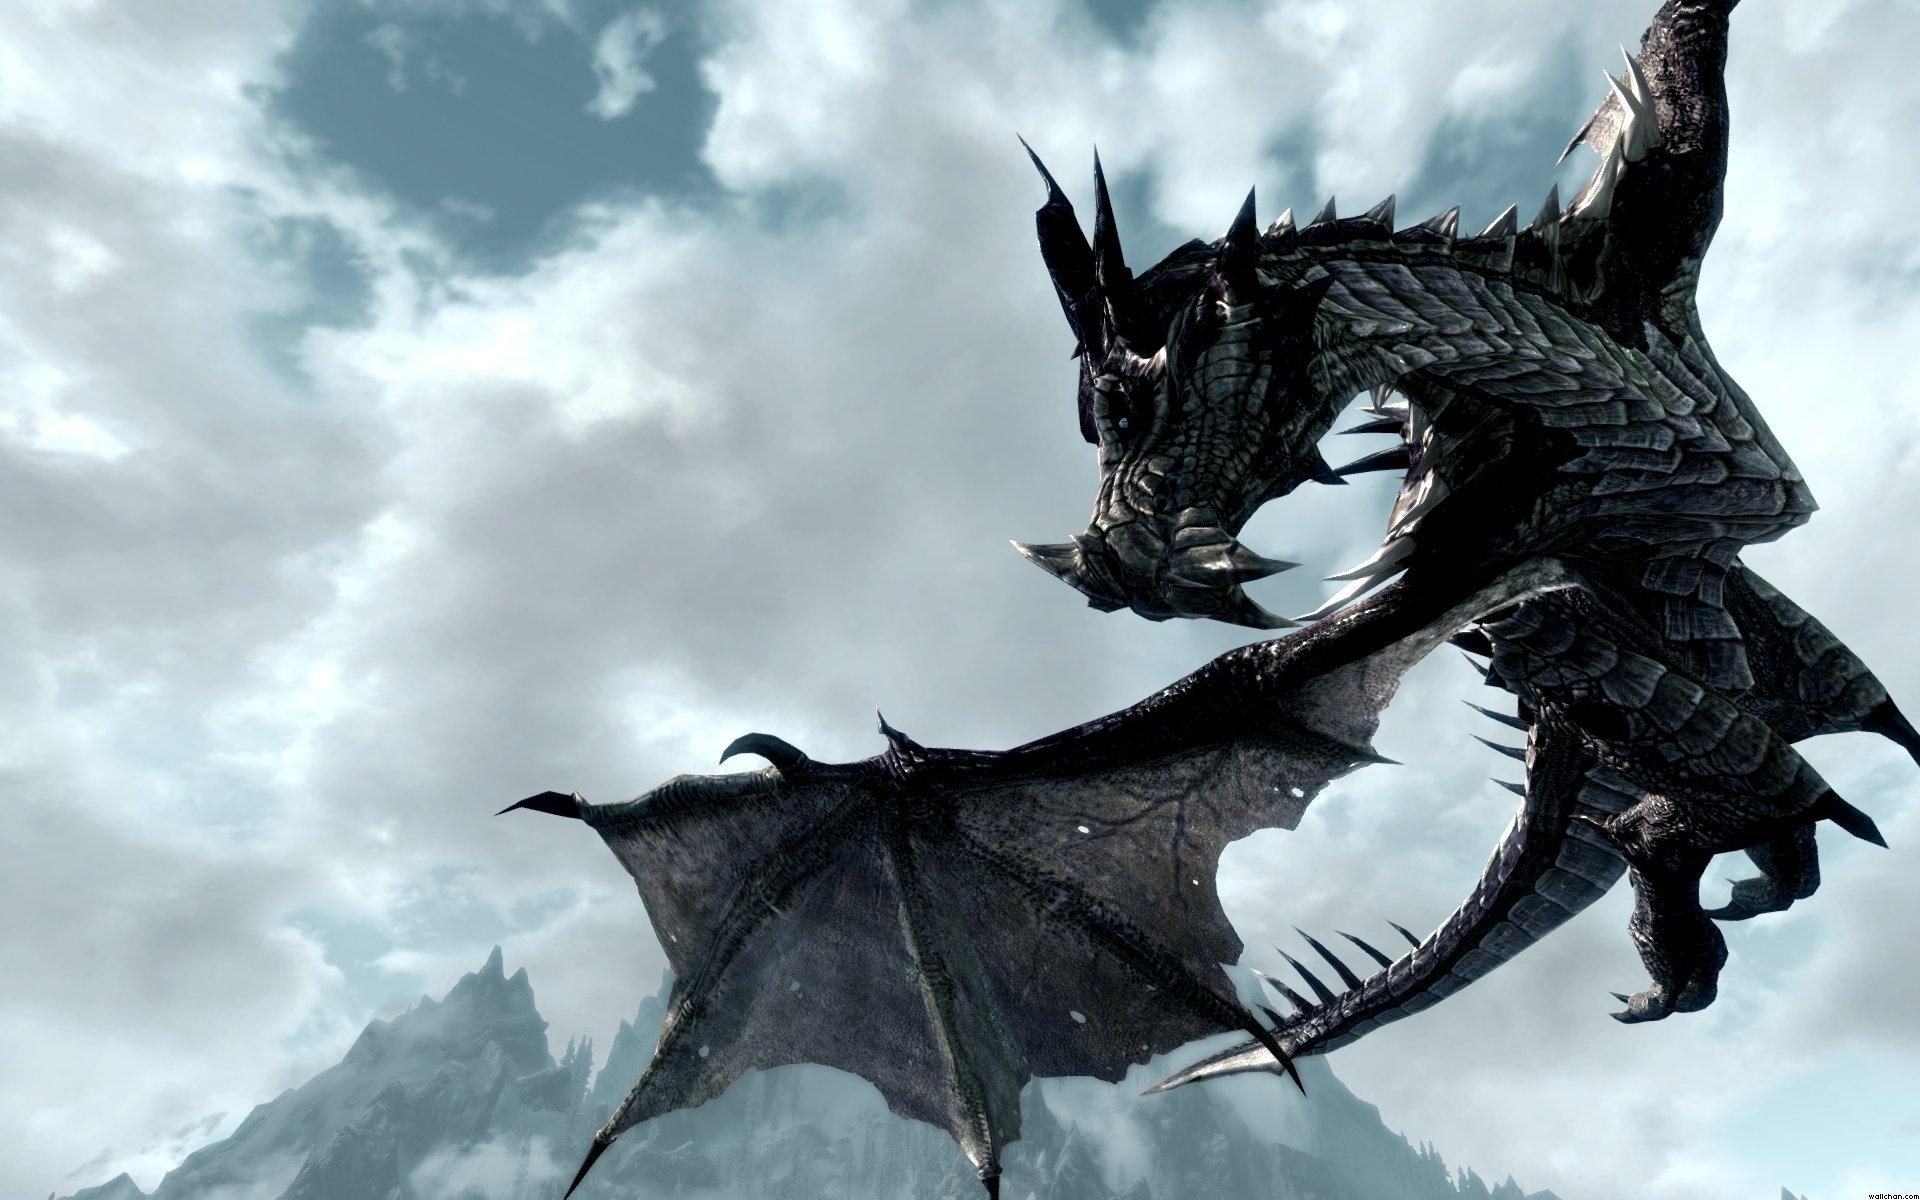 Dragon Skyrim Wallpaper Hd Snow Dragon Skyrim Skyrim Wallpaper